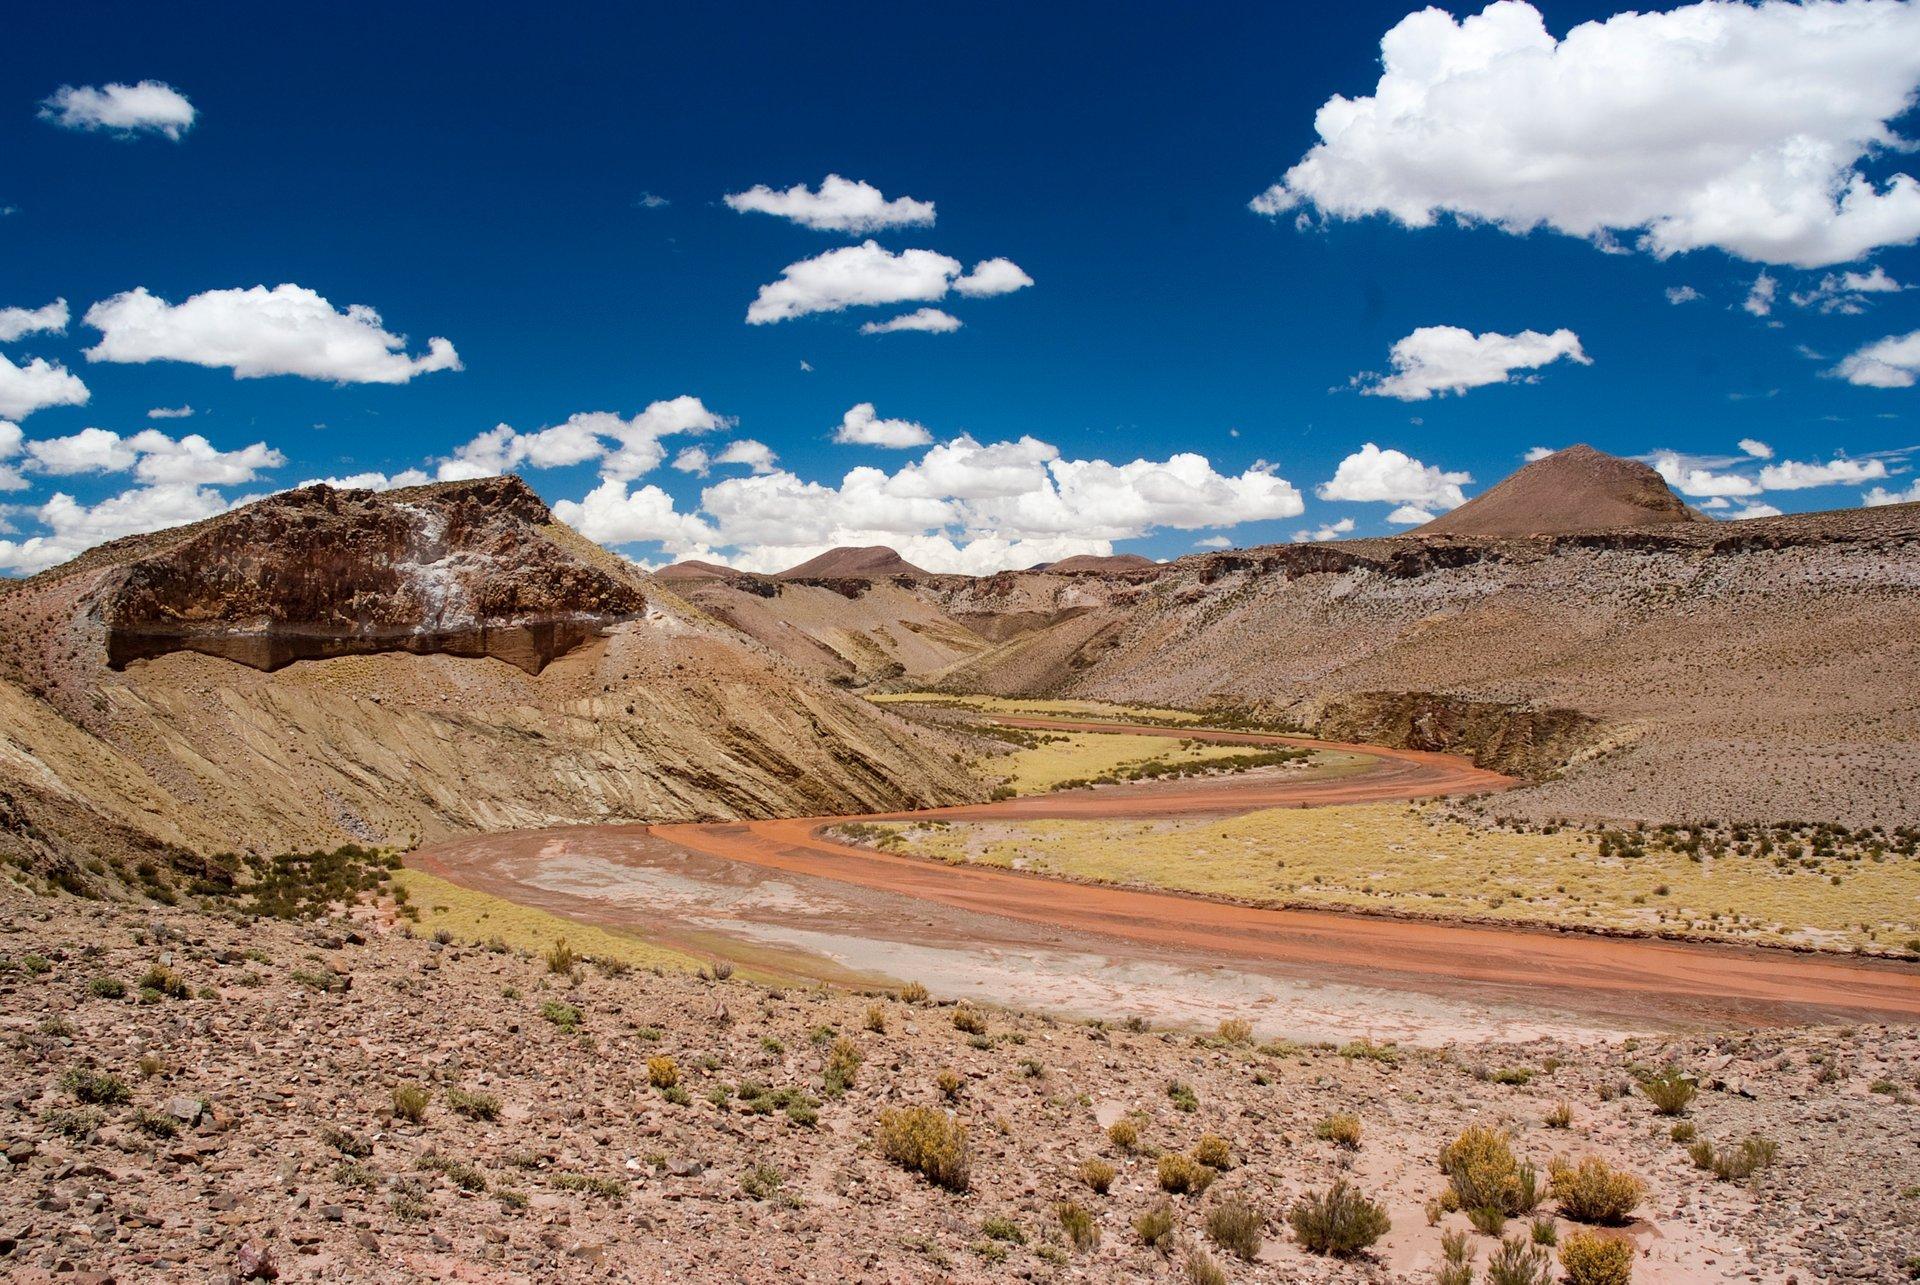 Ruta Provincial 74. Part of Ruta 40 in Jujuy Province, Argentina 2020